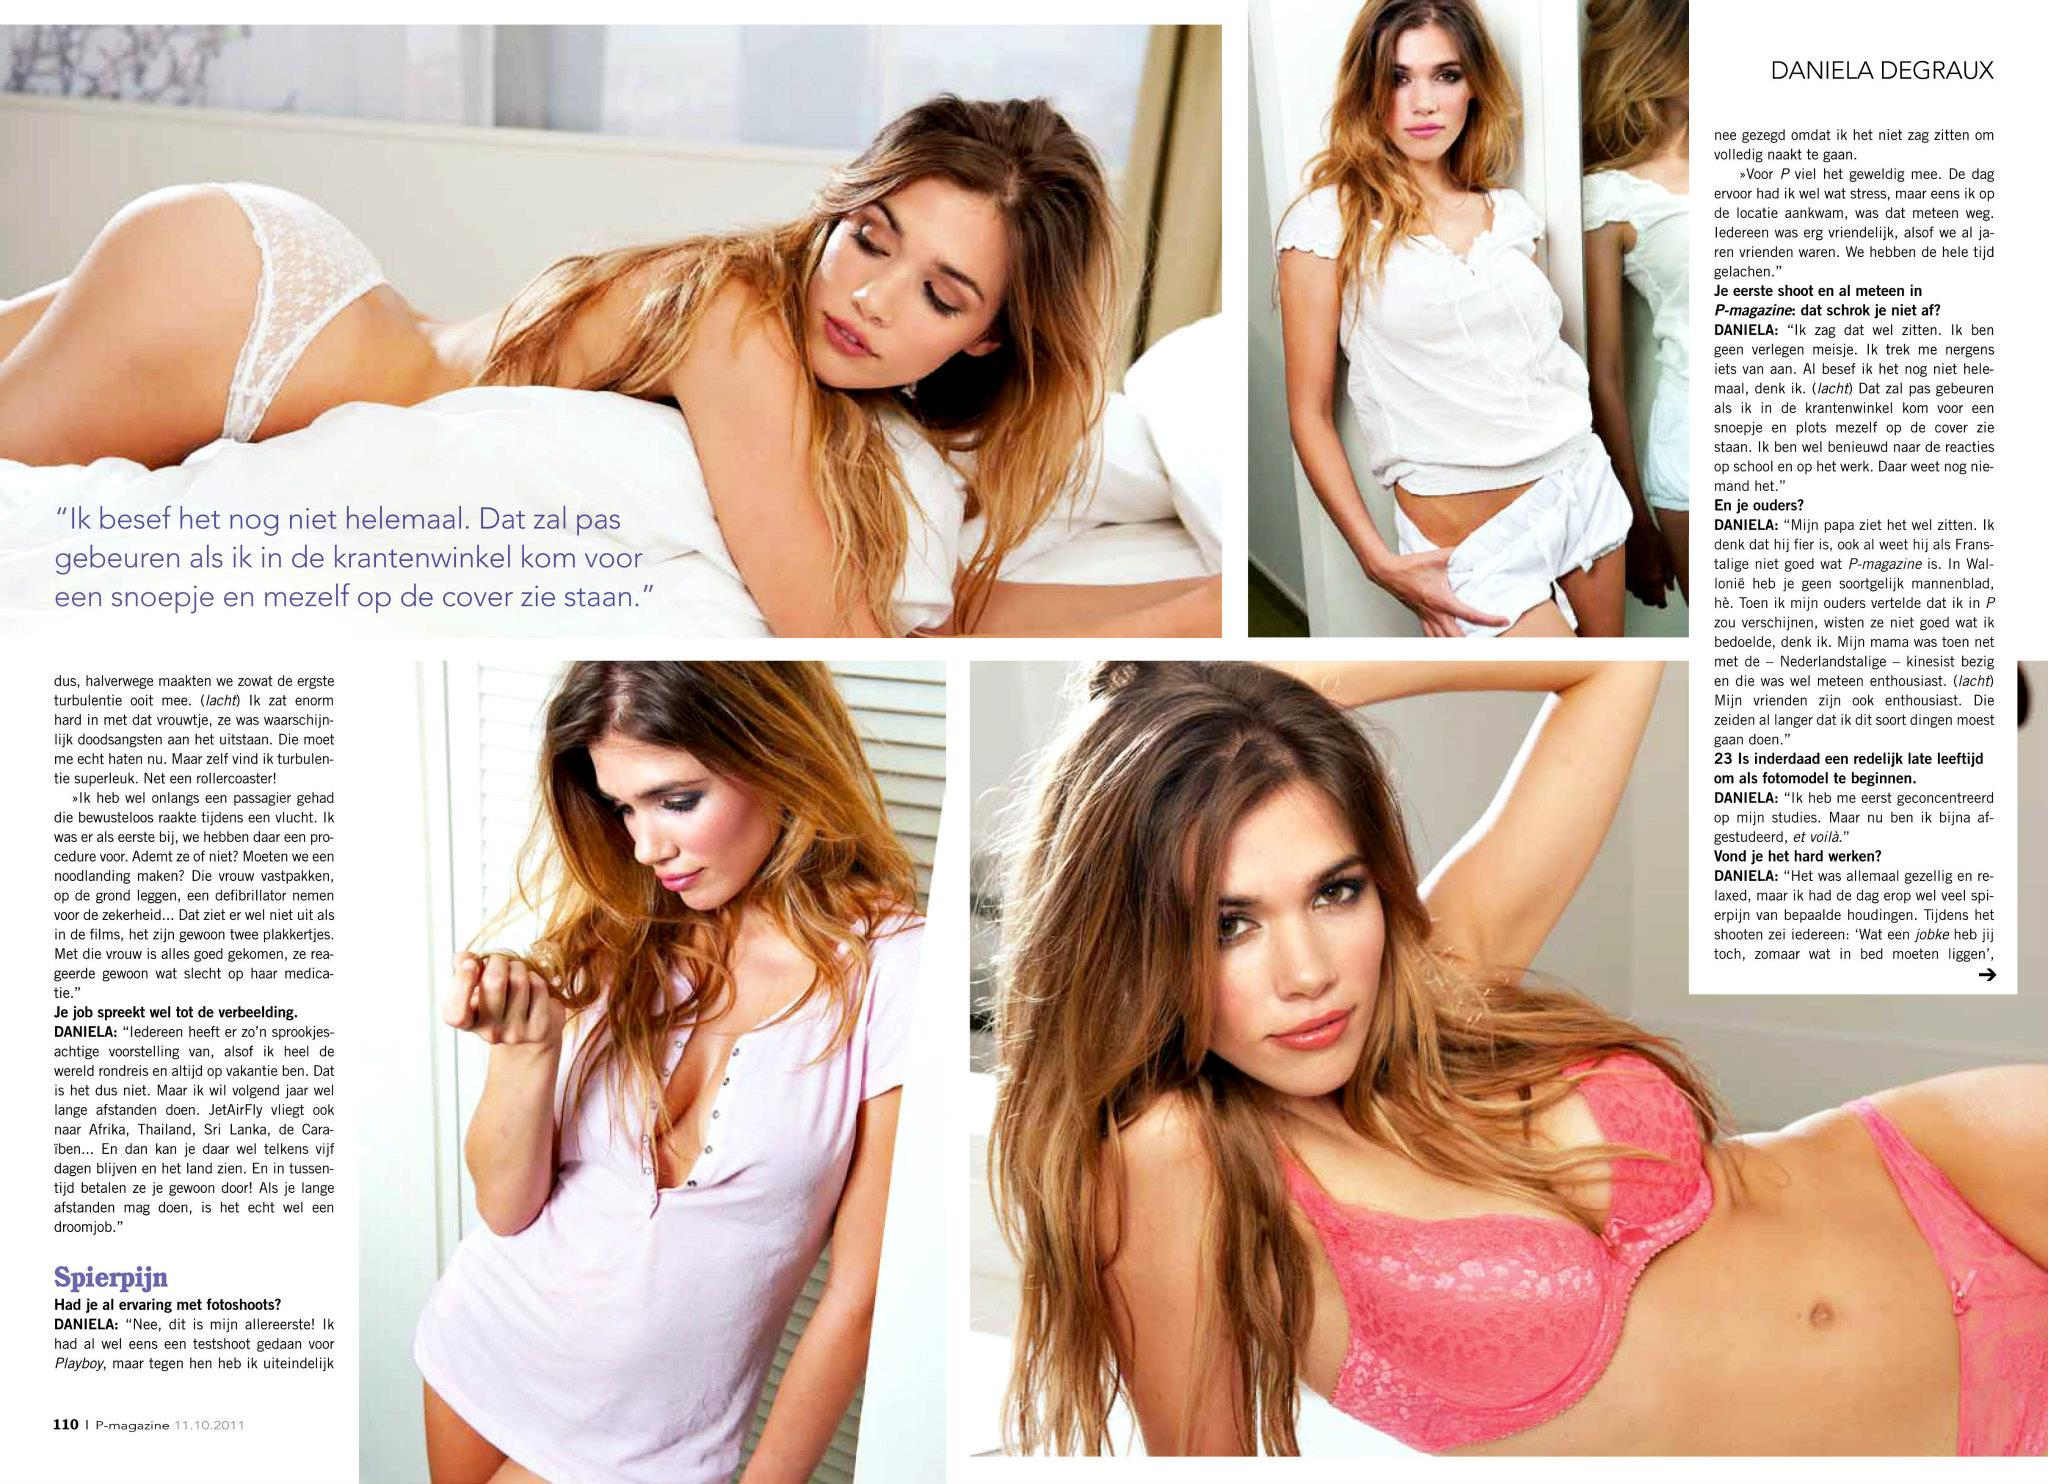 bart albrecht fotograaf photographer belgium p magazine che playboy editorial magazines glamour boudoir daniela degraux kelly buytaert 0004.jpg